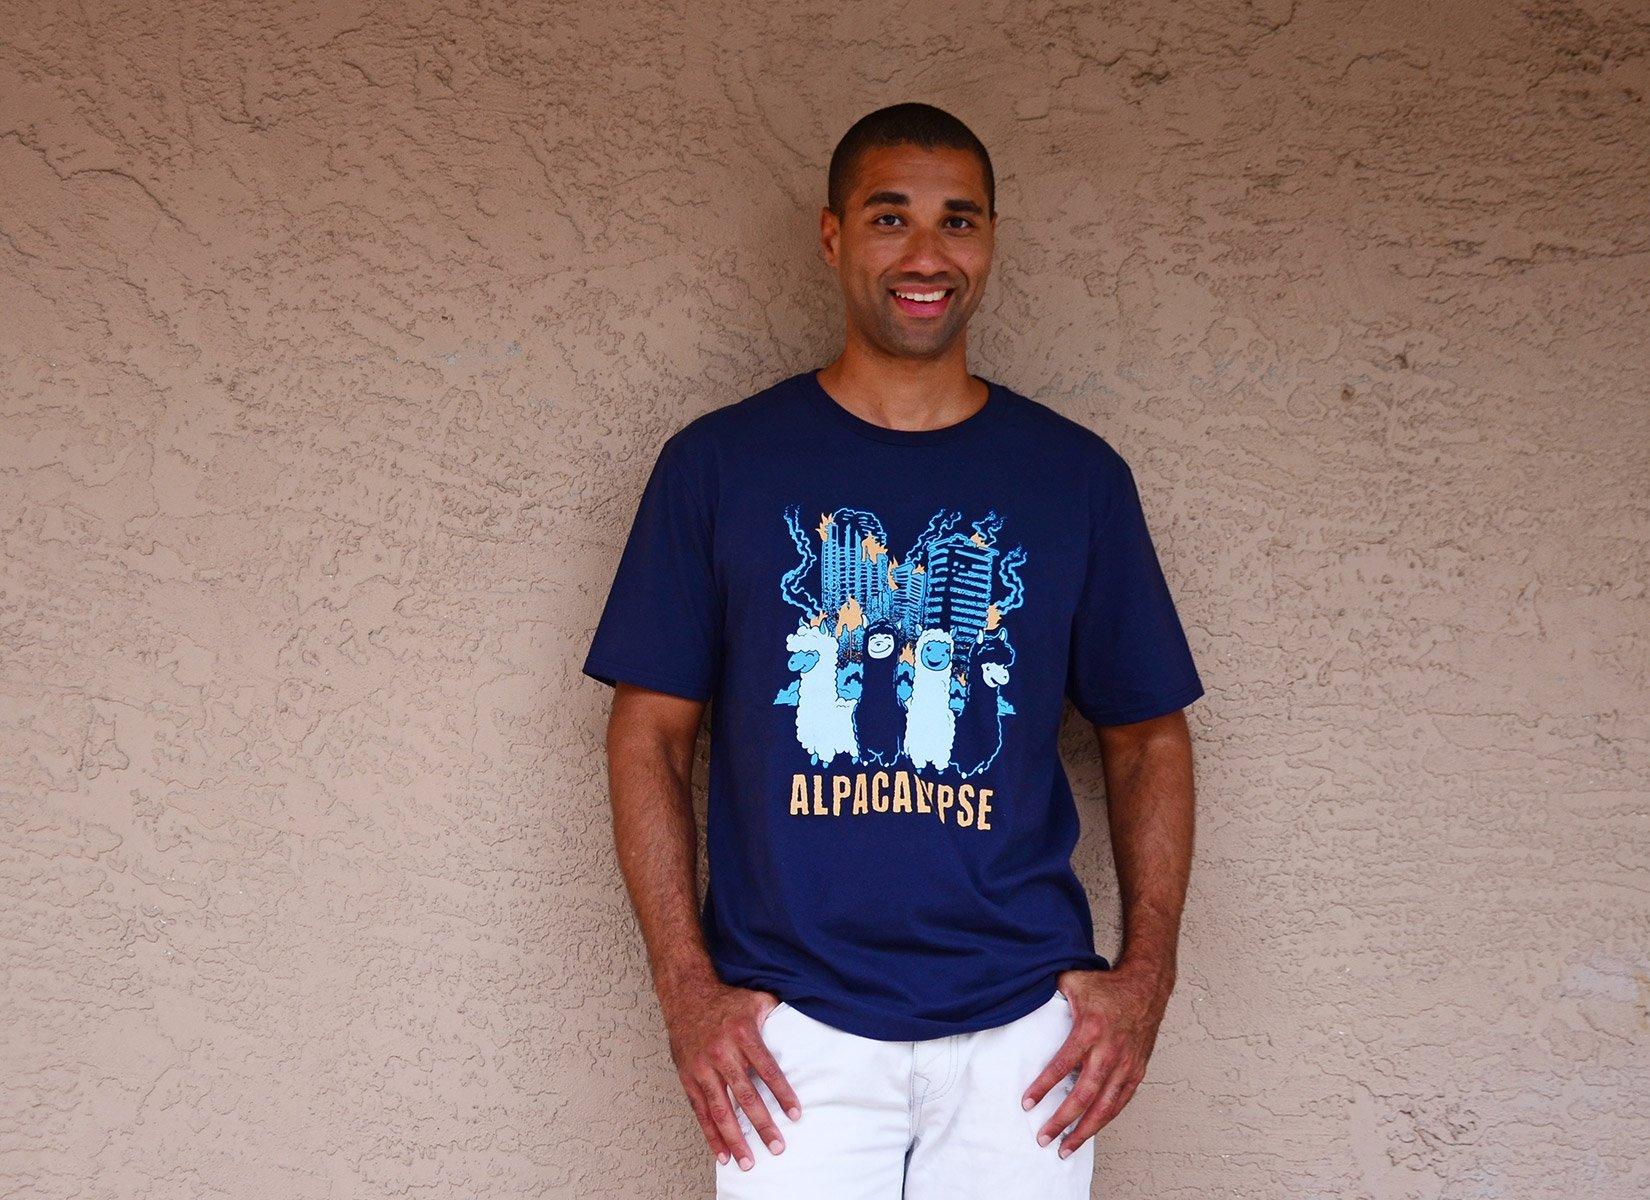 Alpacalypse on Mens T-Shirt